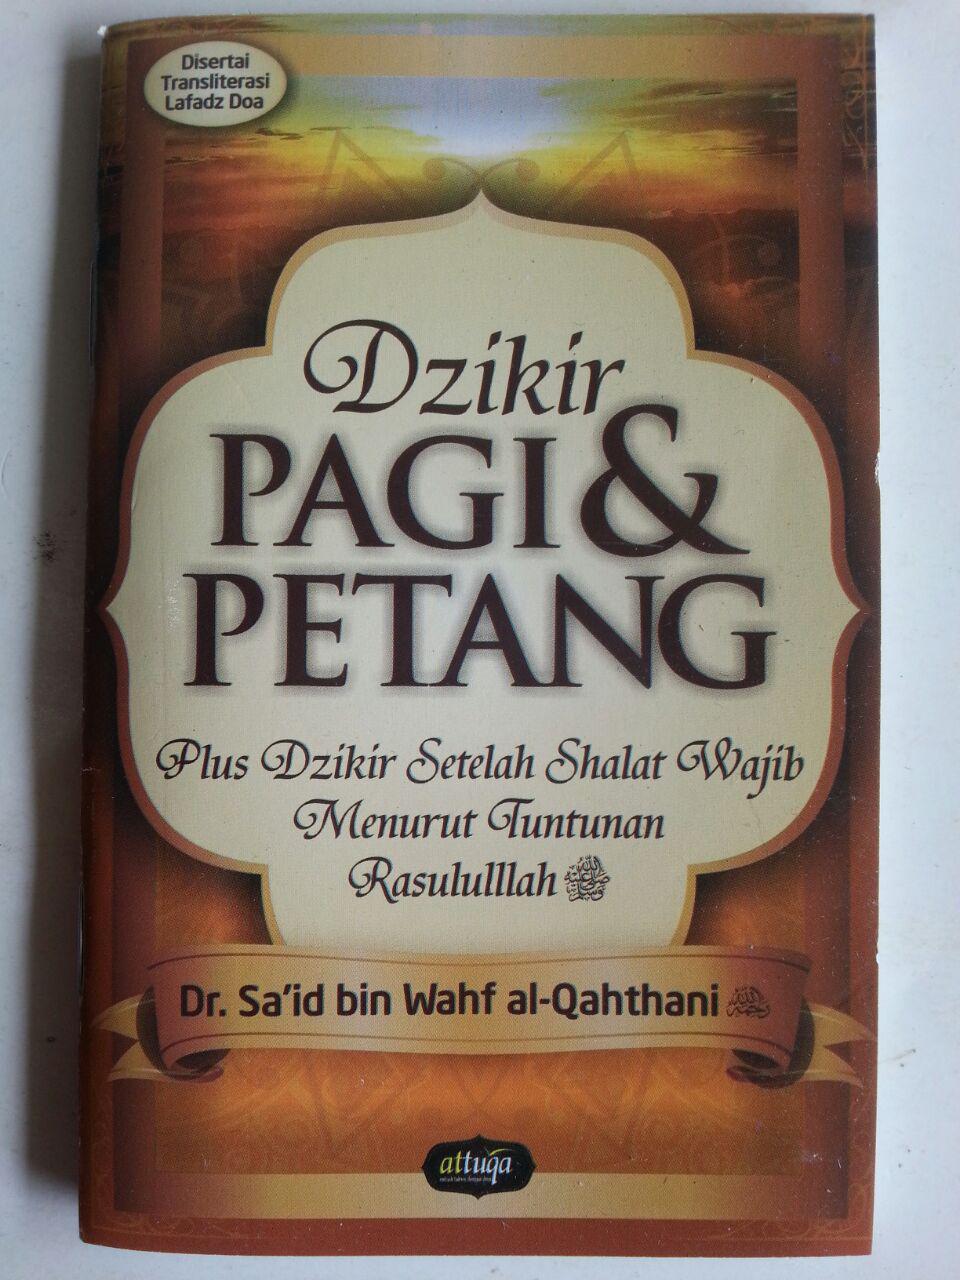 Buku Saku Dzikir Pagi Dan Petang Plus Dzikir Setelah Shalat Wajib cover 2